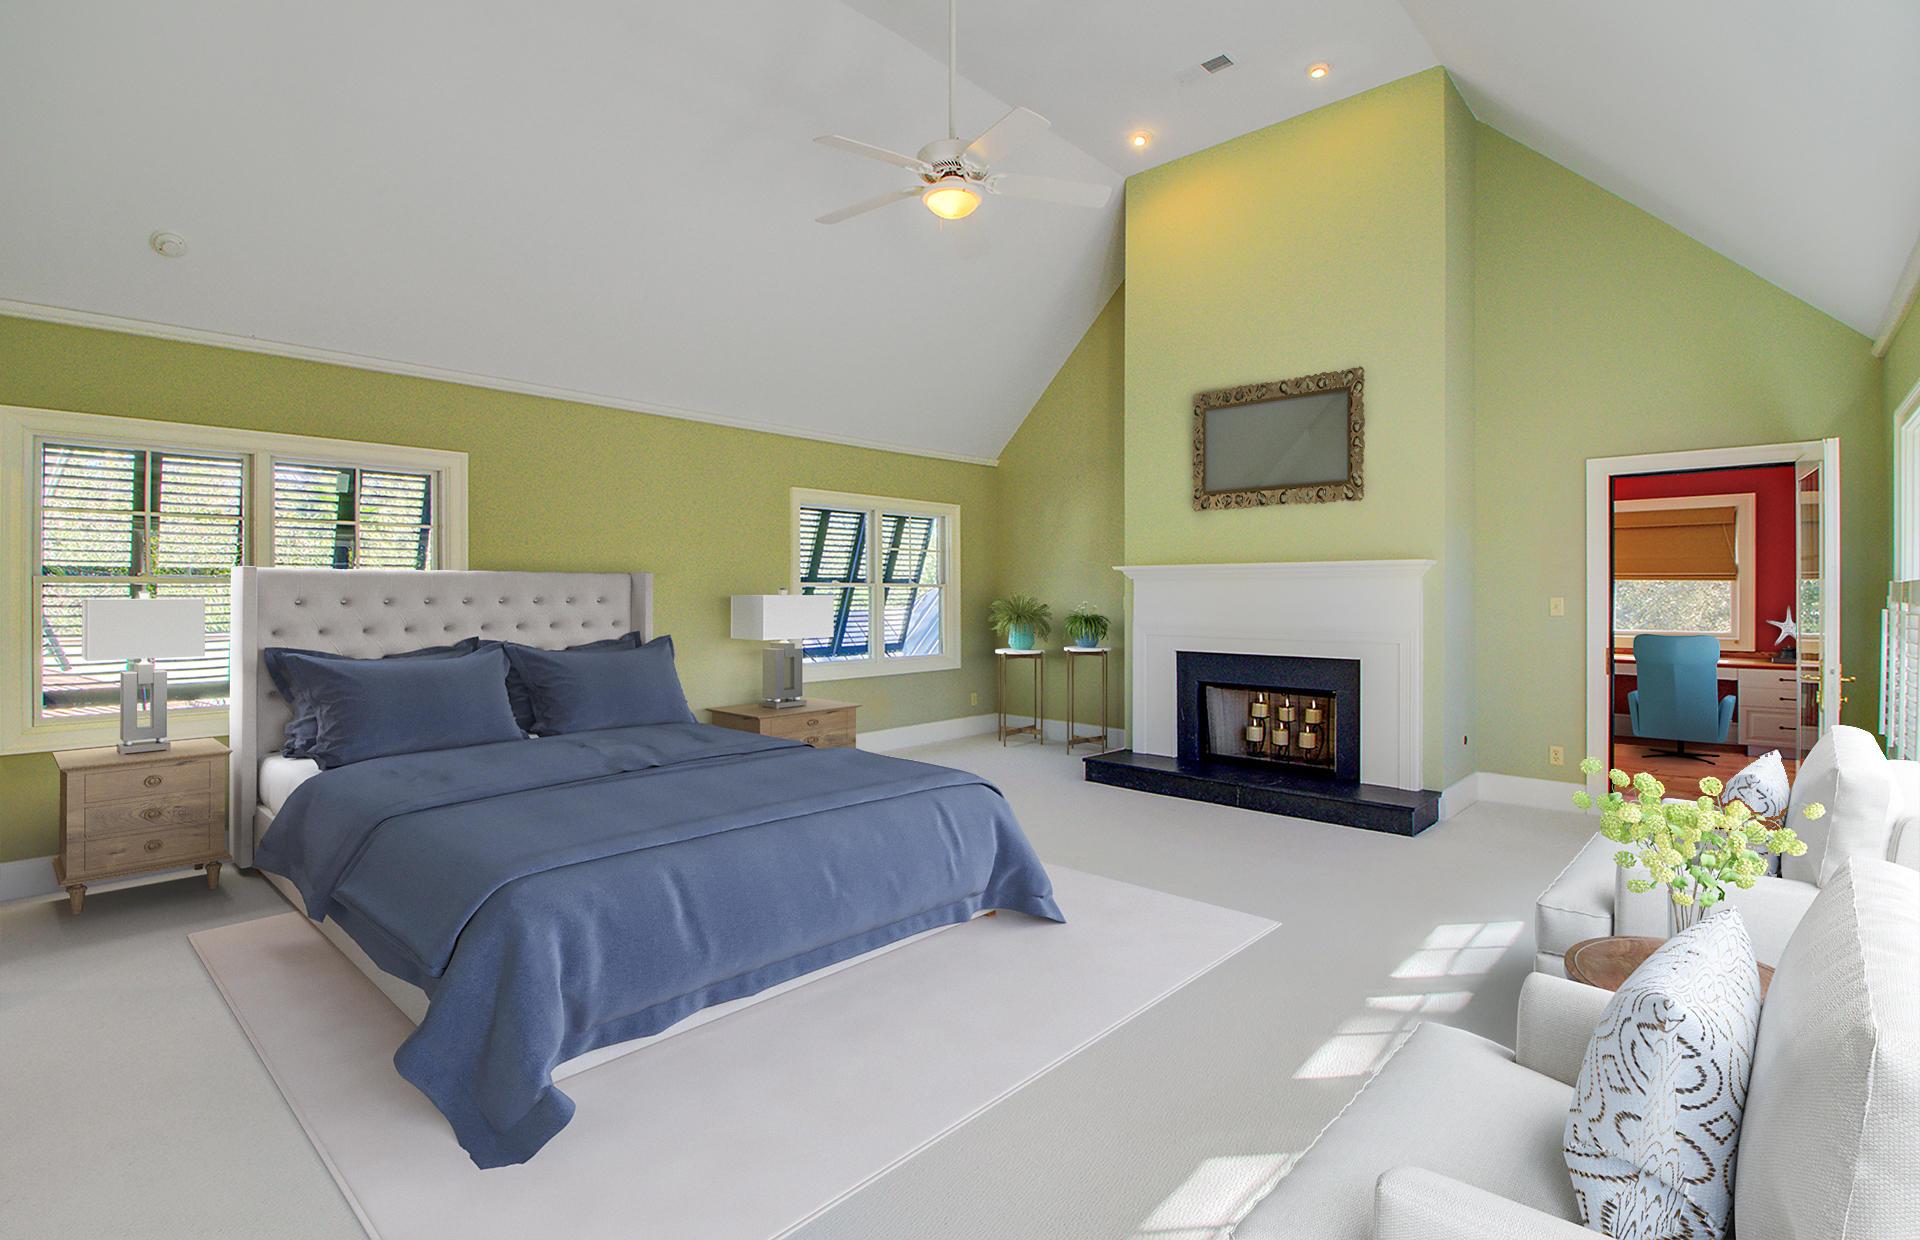 Kiawah Island Homes For Sale - 402 Ocean Oaks, Kiawah Island, SC - 30